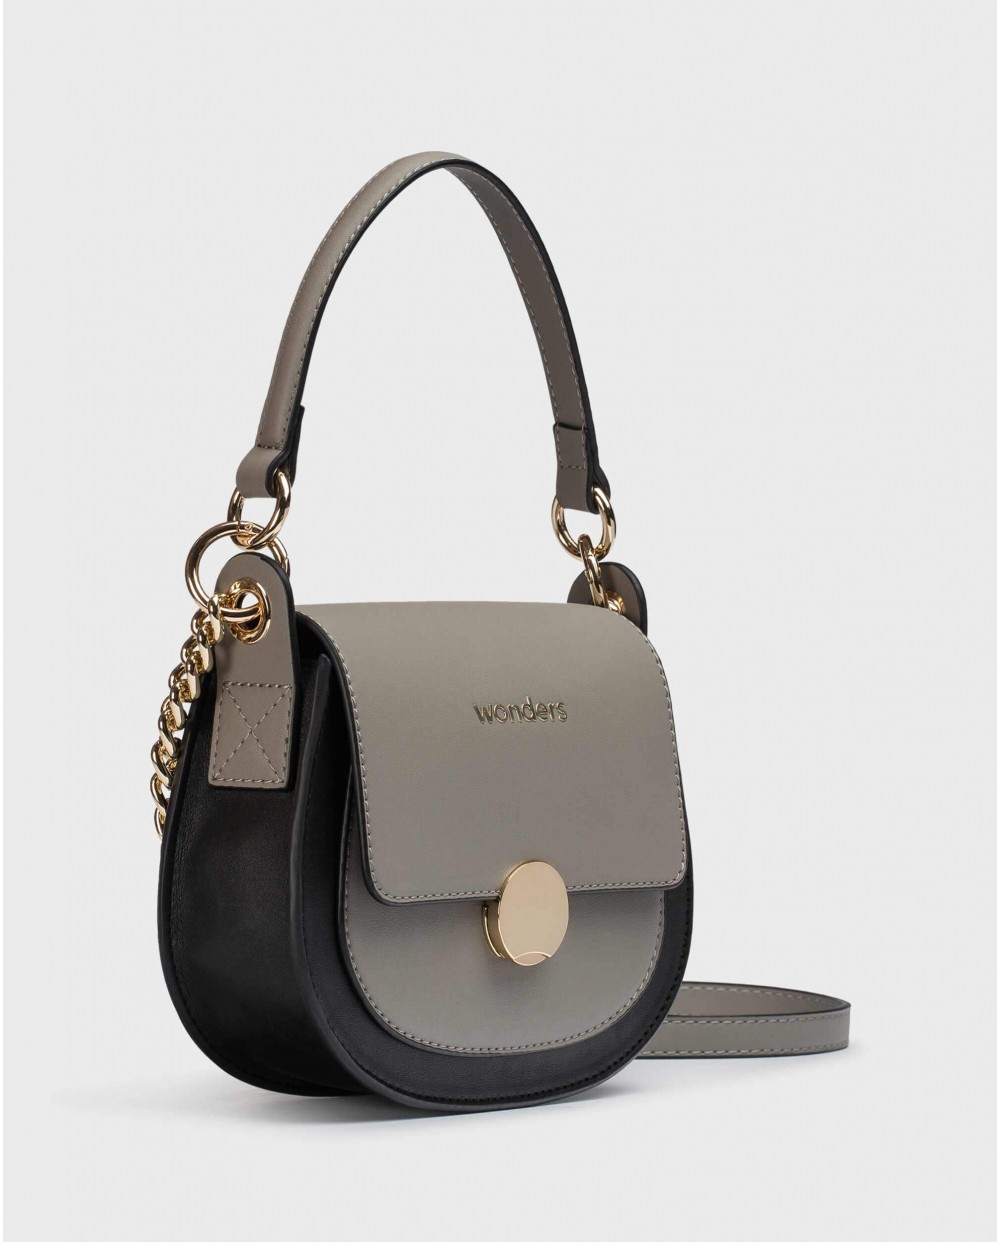 Wonders-Bags-Black Harper Bag